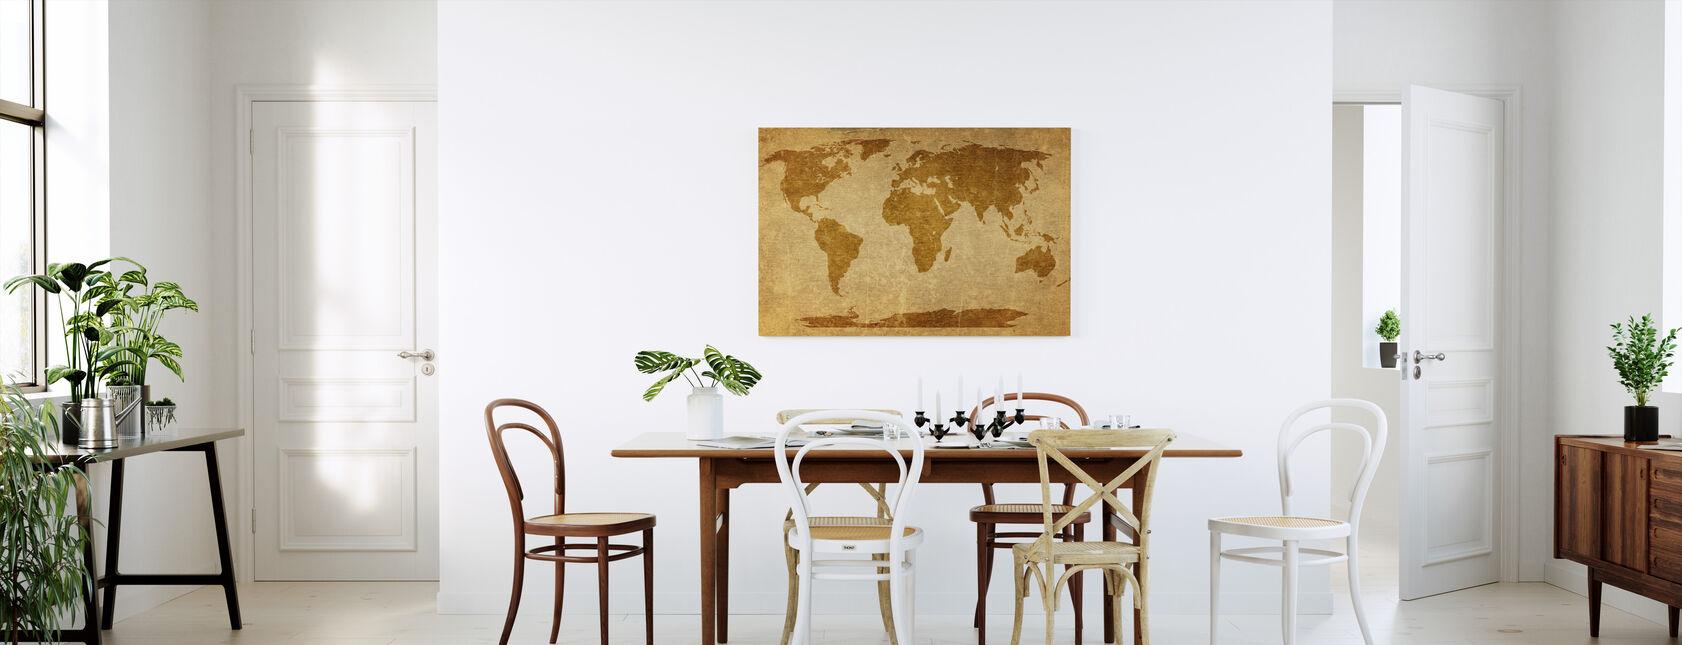 Sepia World Map - Canvas print - Kitchen